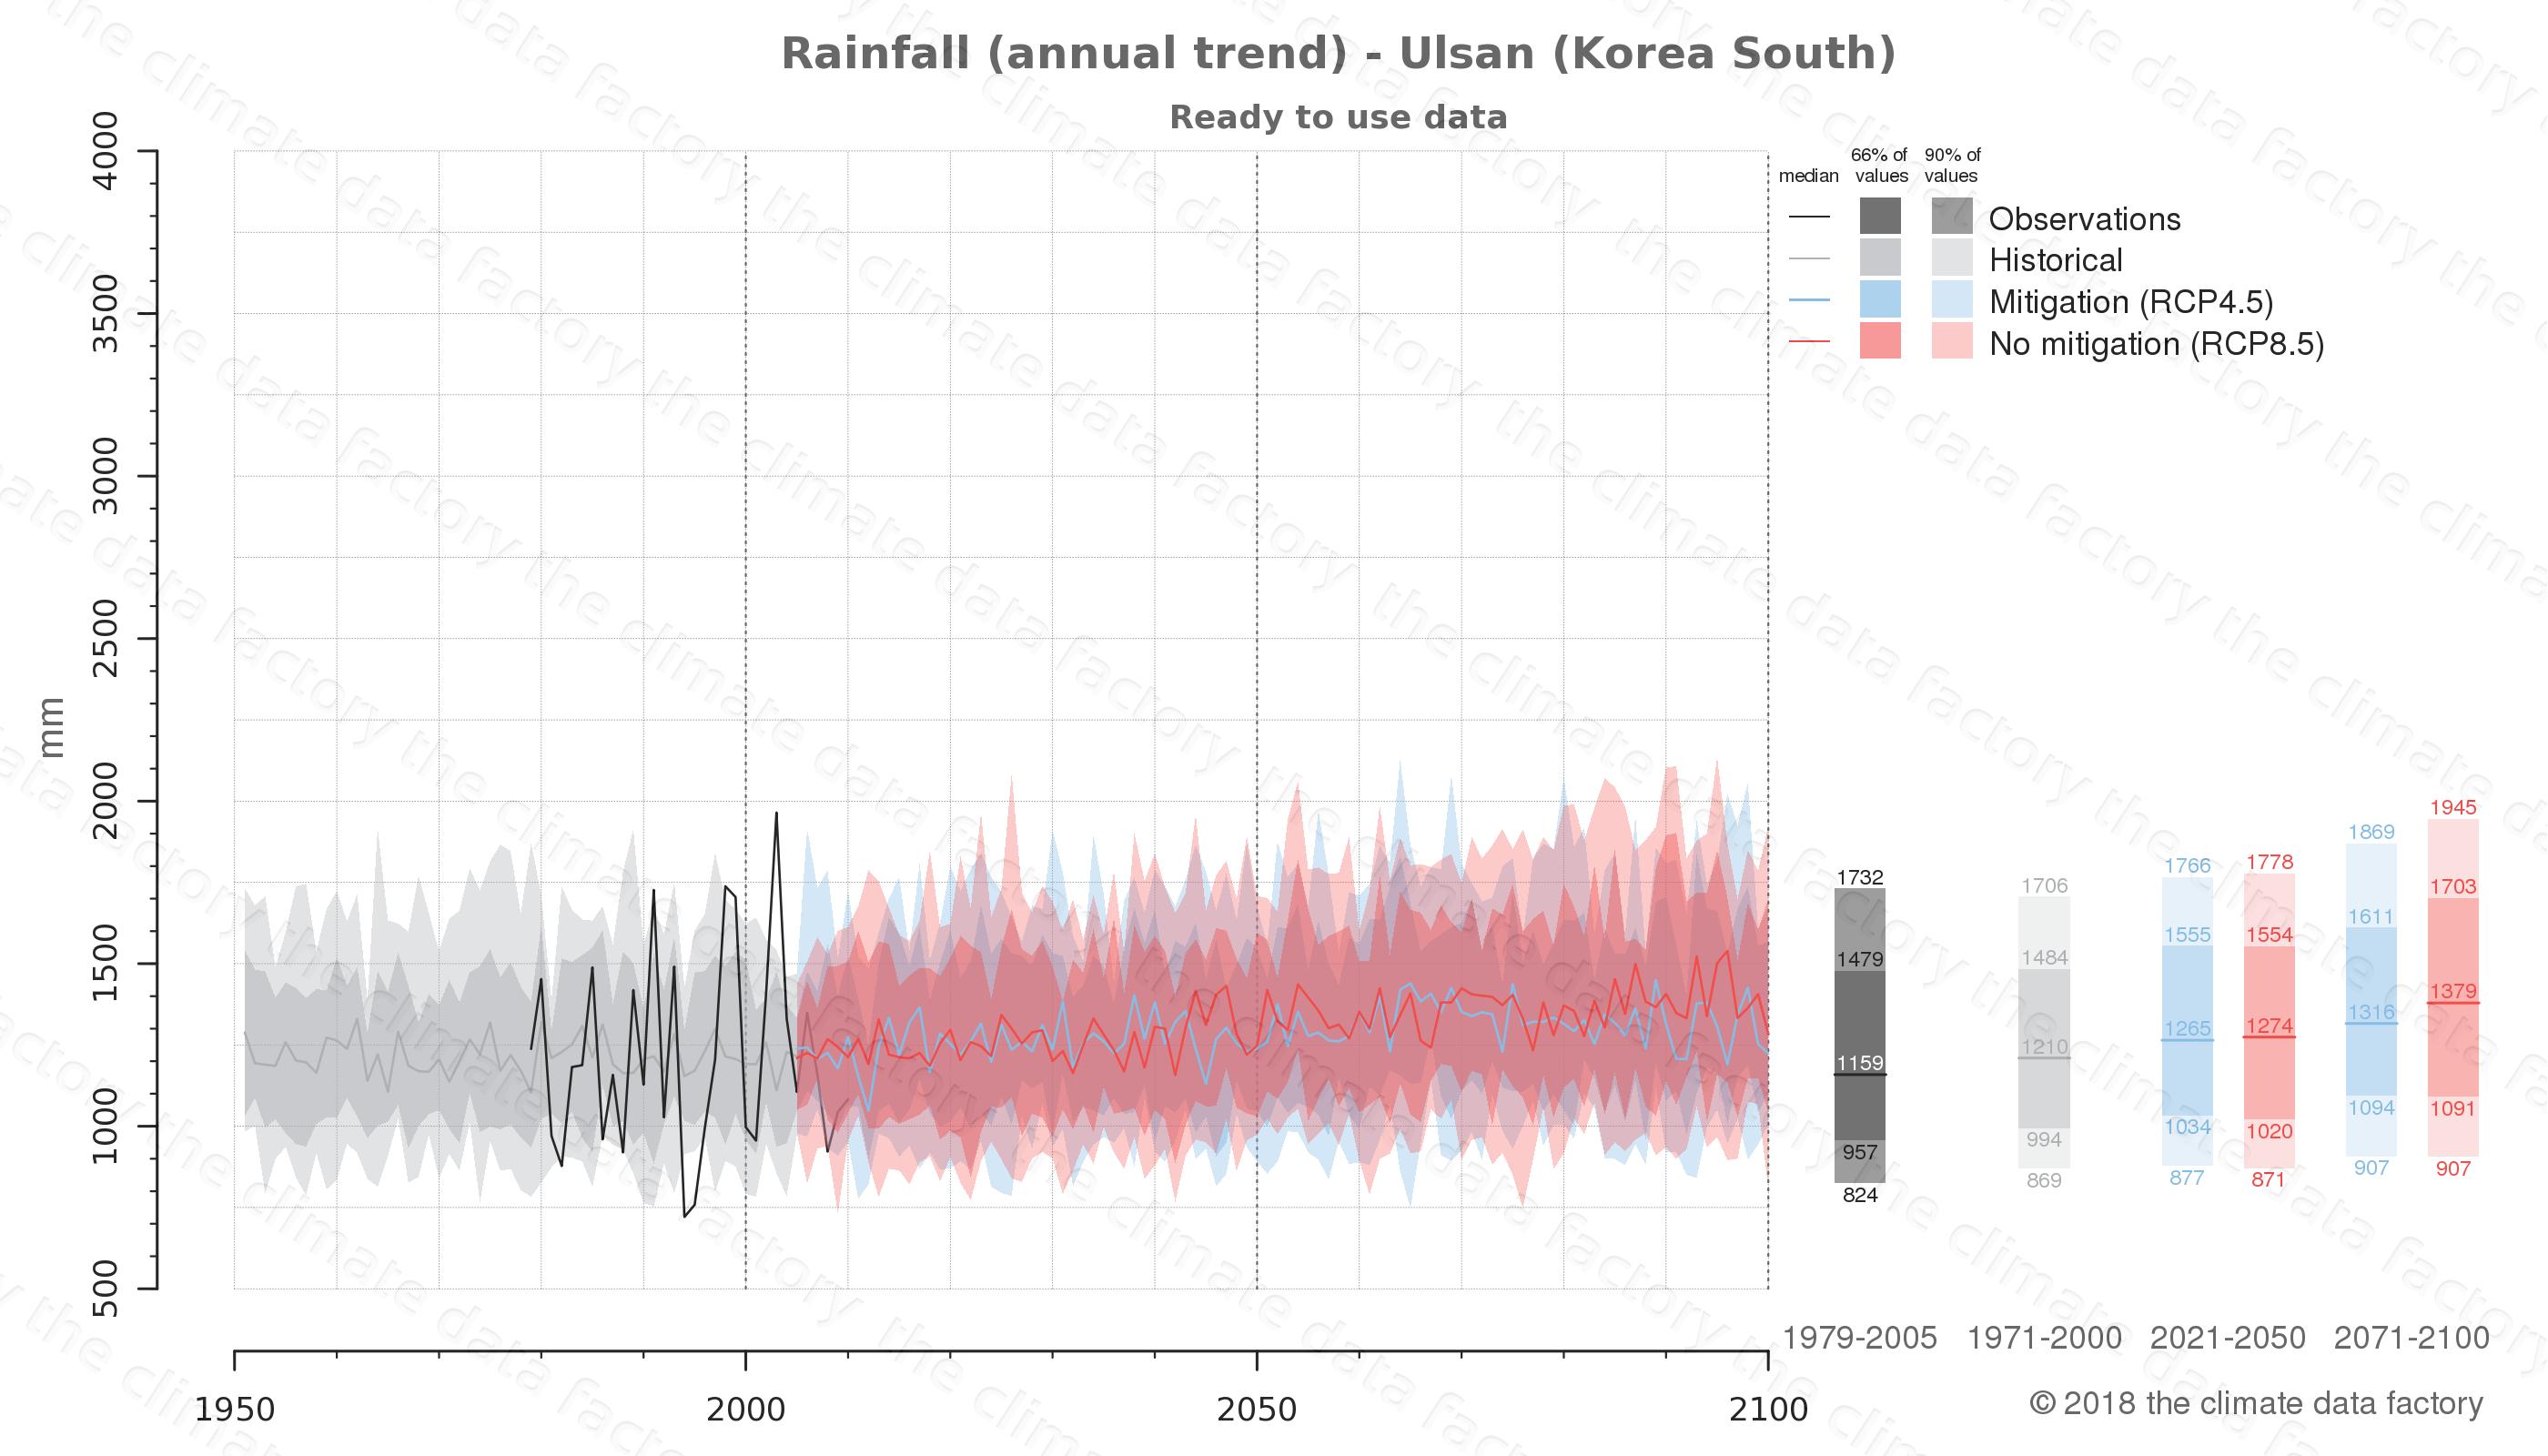 climate change data policy adaptation climate graph city data rainfall ulsan south korea